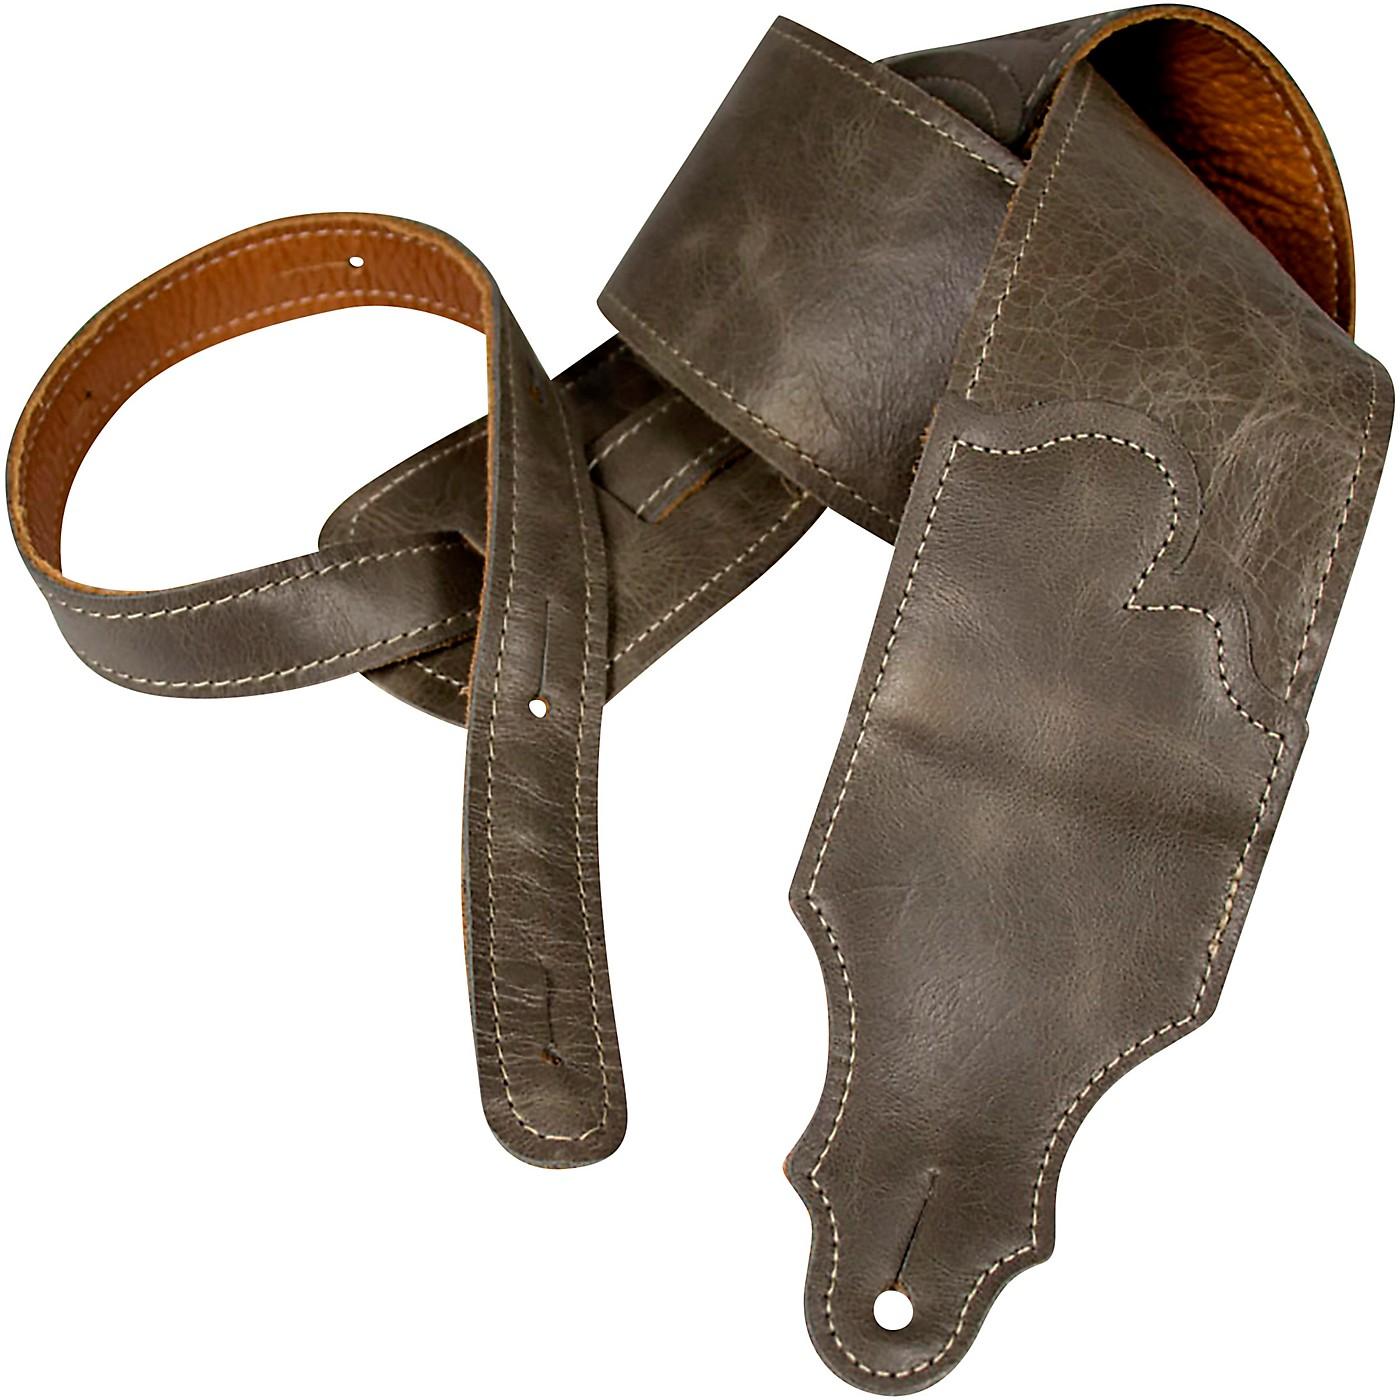 Franklin Strap Jackson Hole Aged Leather Guitar Strap thumbnail